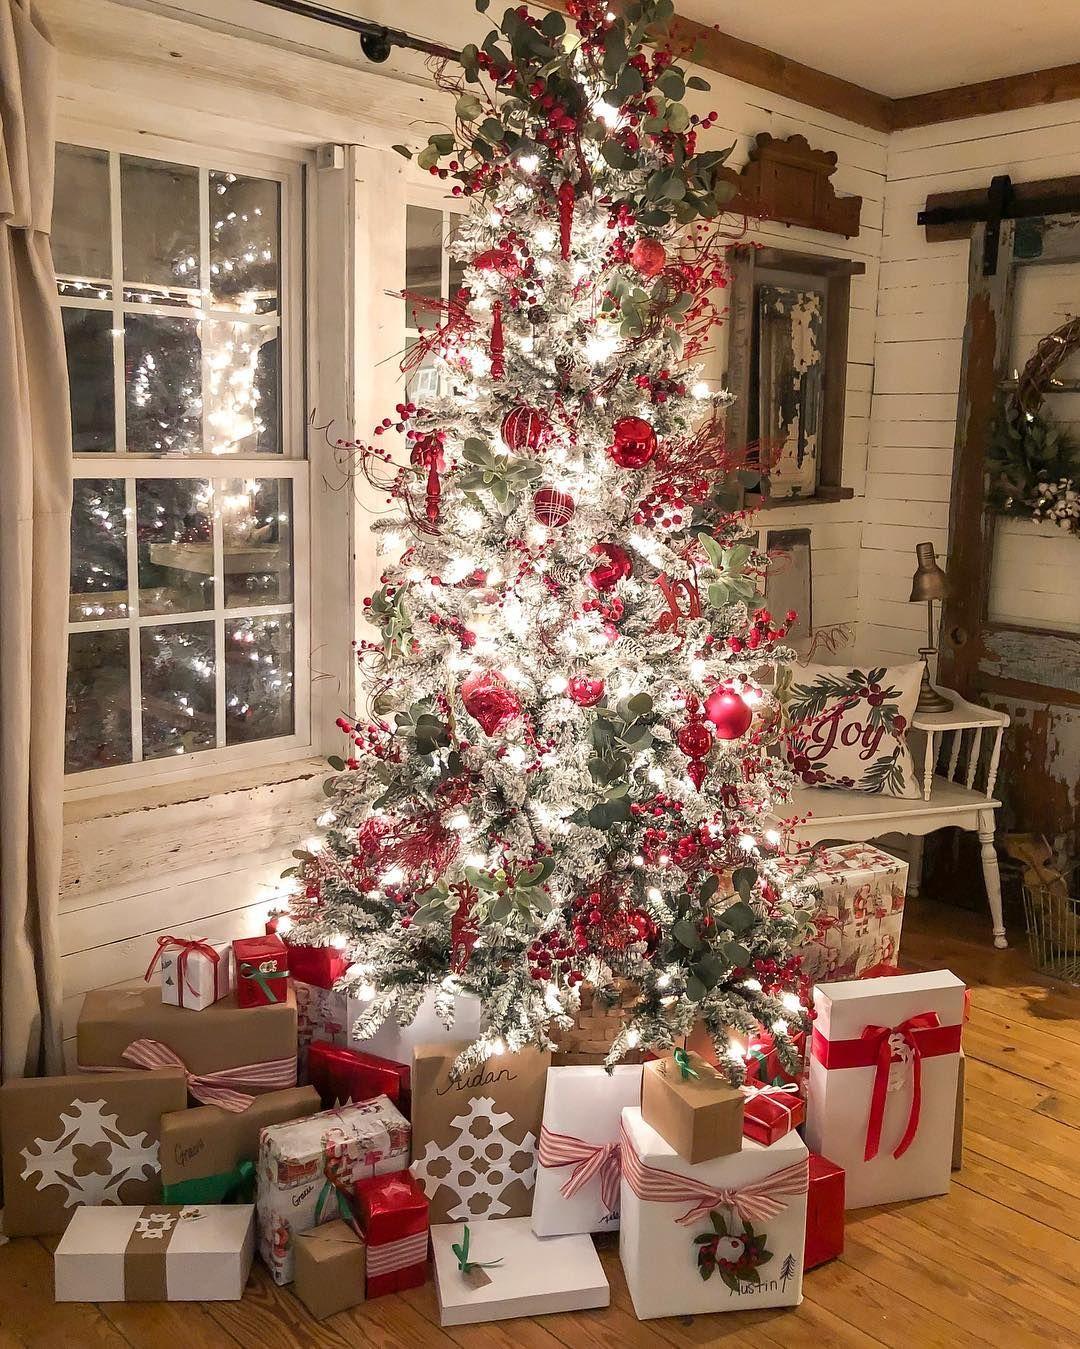 Ashley Mcalpin On Instagram Merry Christmas Eve Alabama Joycrossro Christmas House Decorations Inside Christmas Home Christmas Decorations Cheap